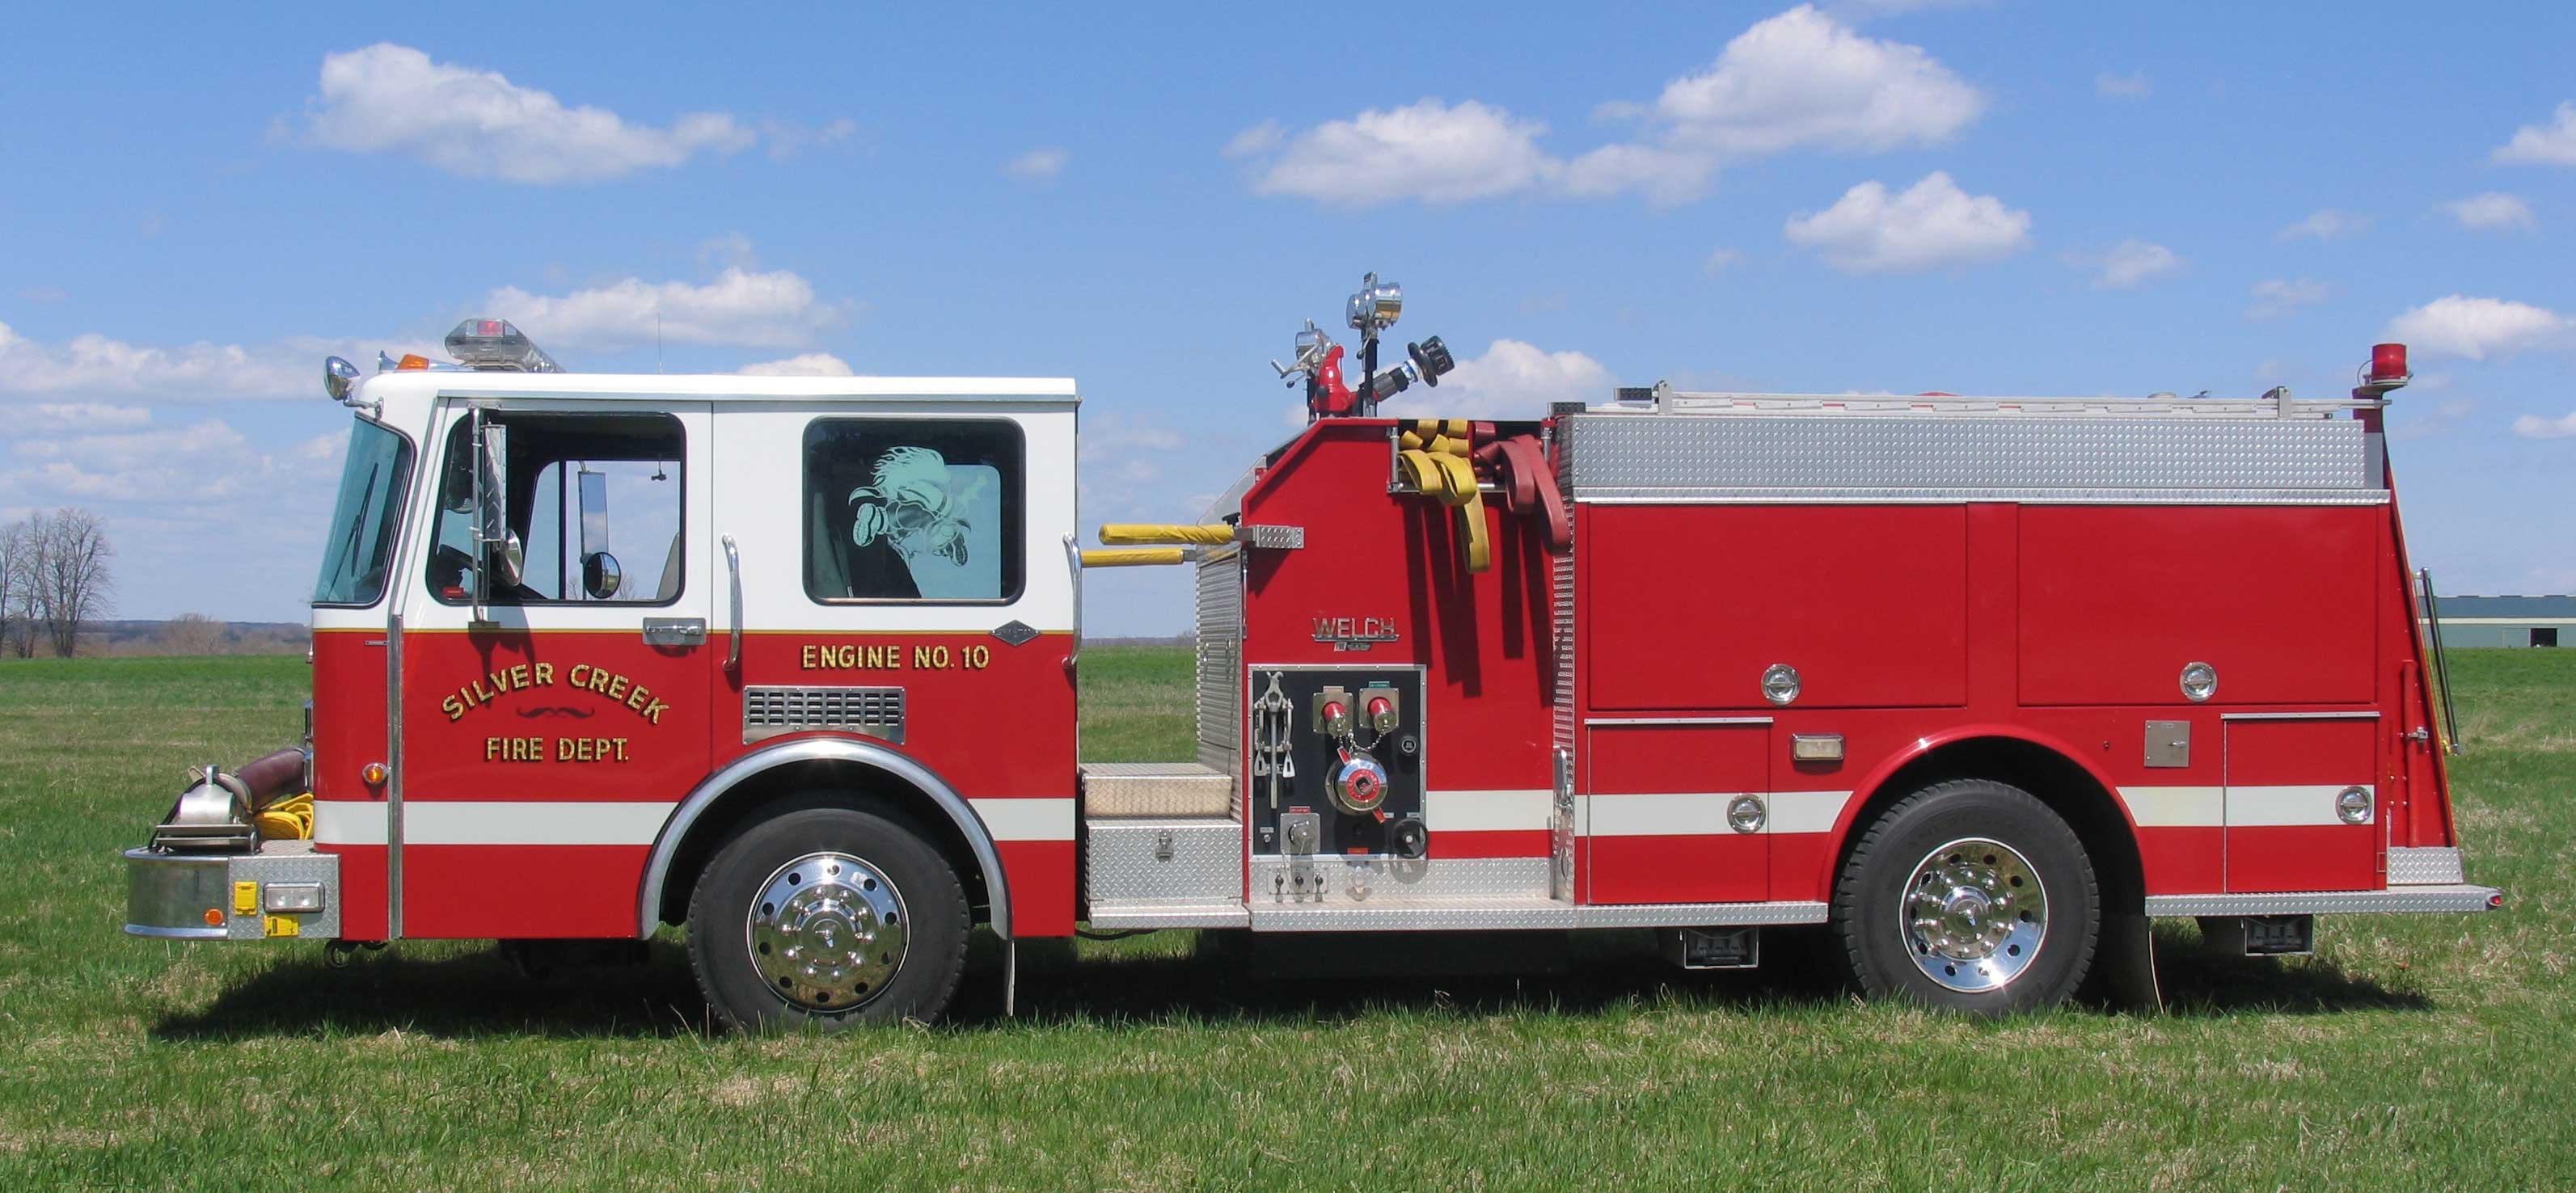 Silver Creek Fire Department Apparatus